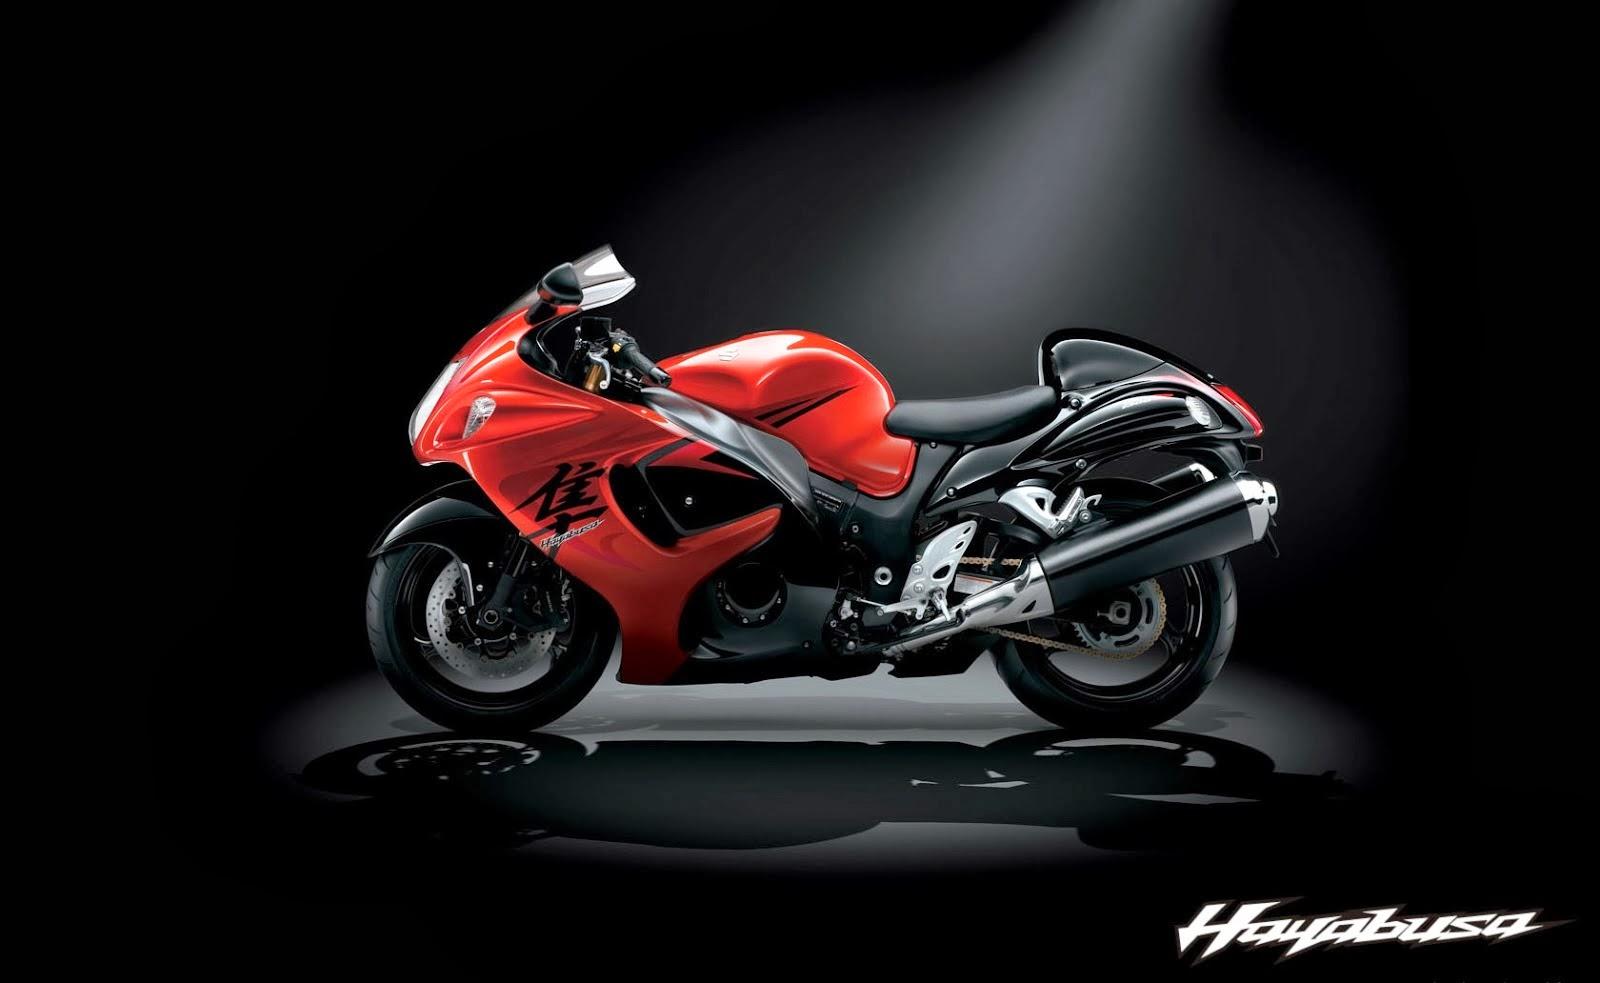 Motorcycle Racing On The Sand Suzuki Hd Desktop Mobile: HD WALLPAPERS: Download Suzuki Hayabusa Sports Bikes HD